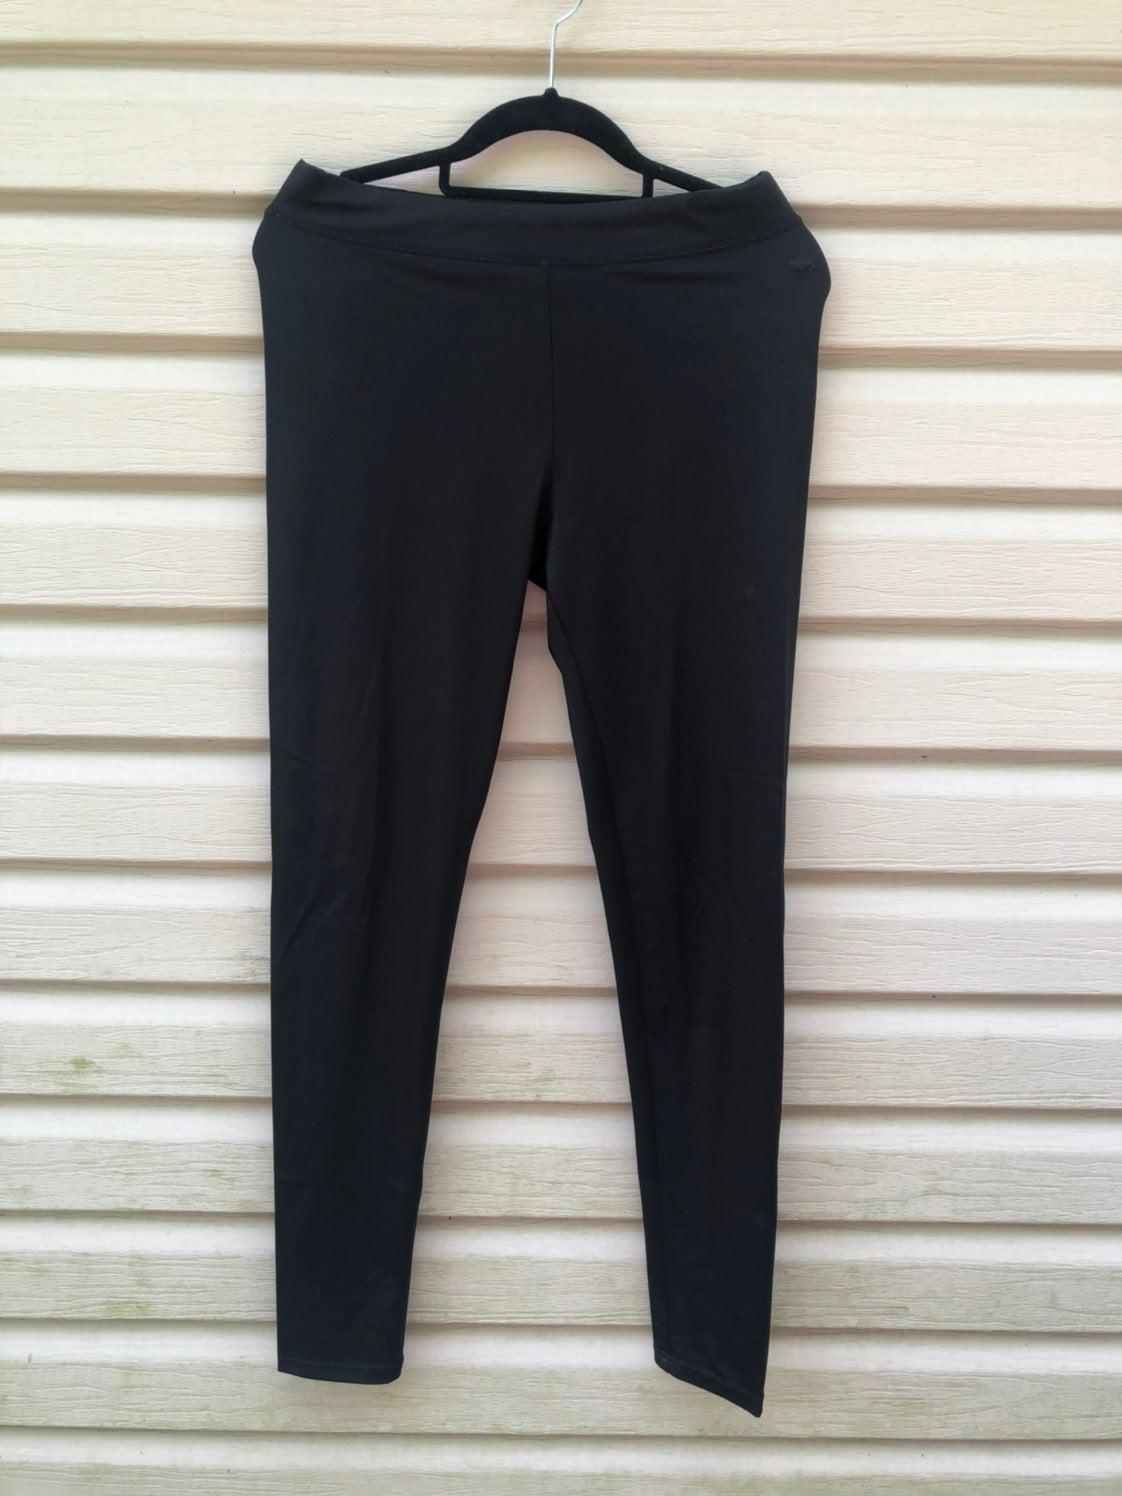 PINK VS Medium Black Fashion Leggings